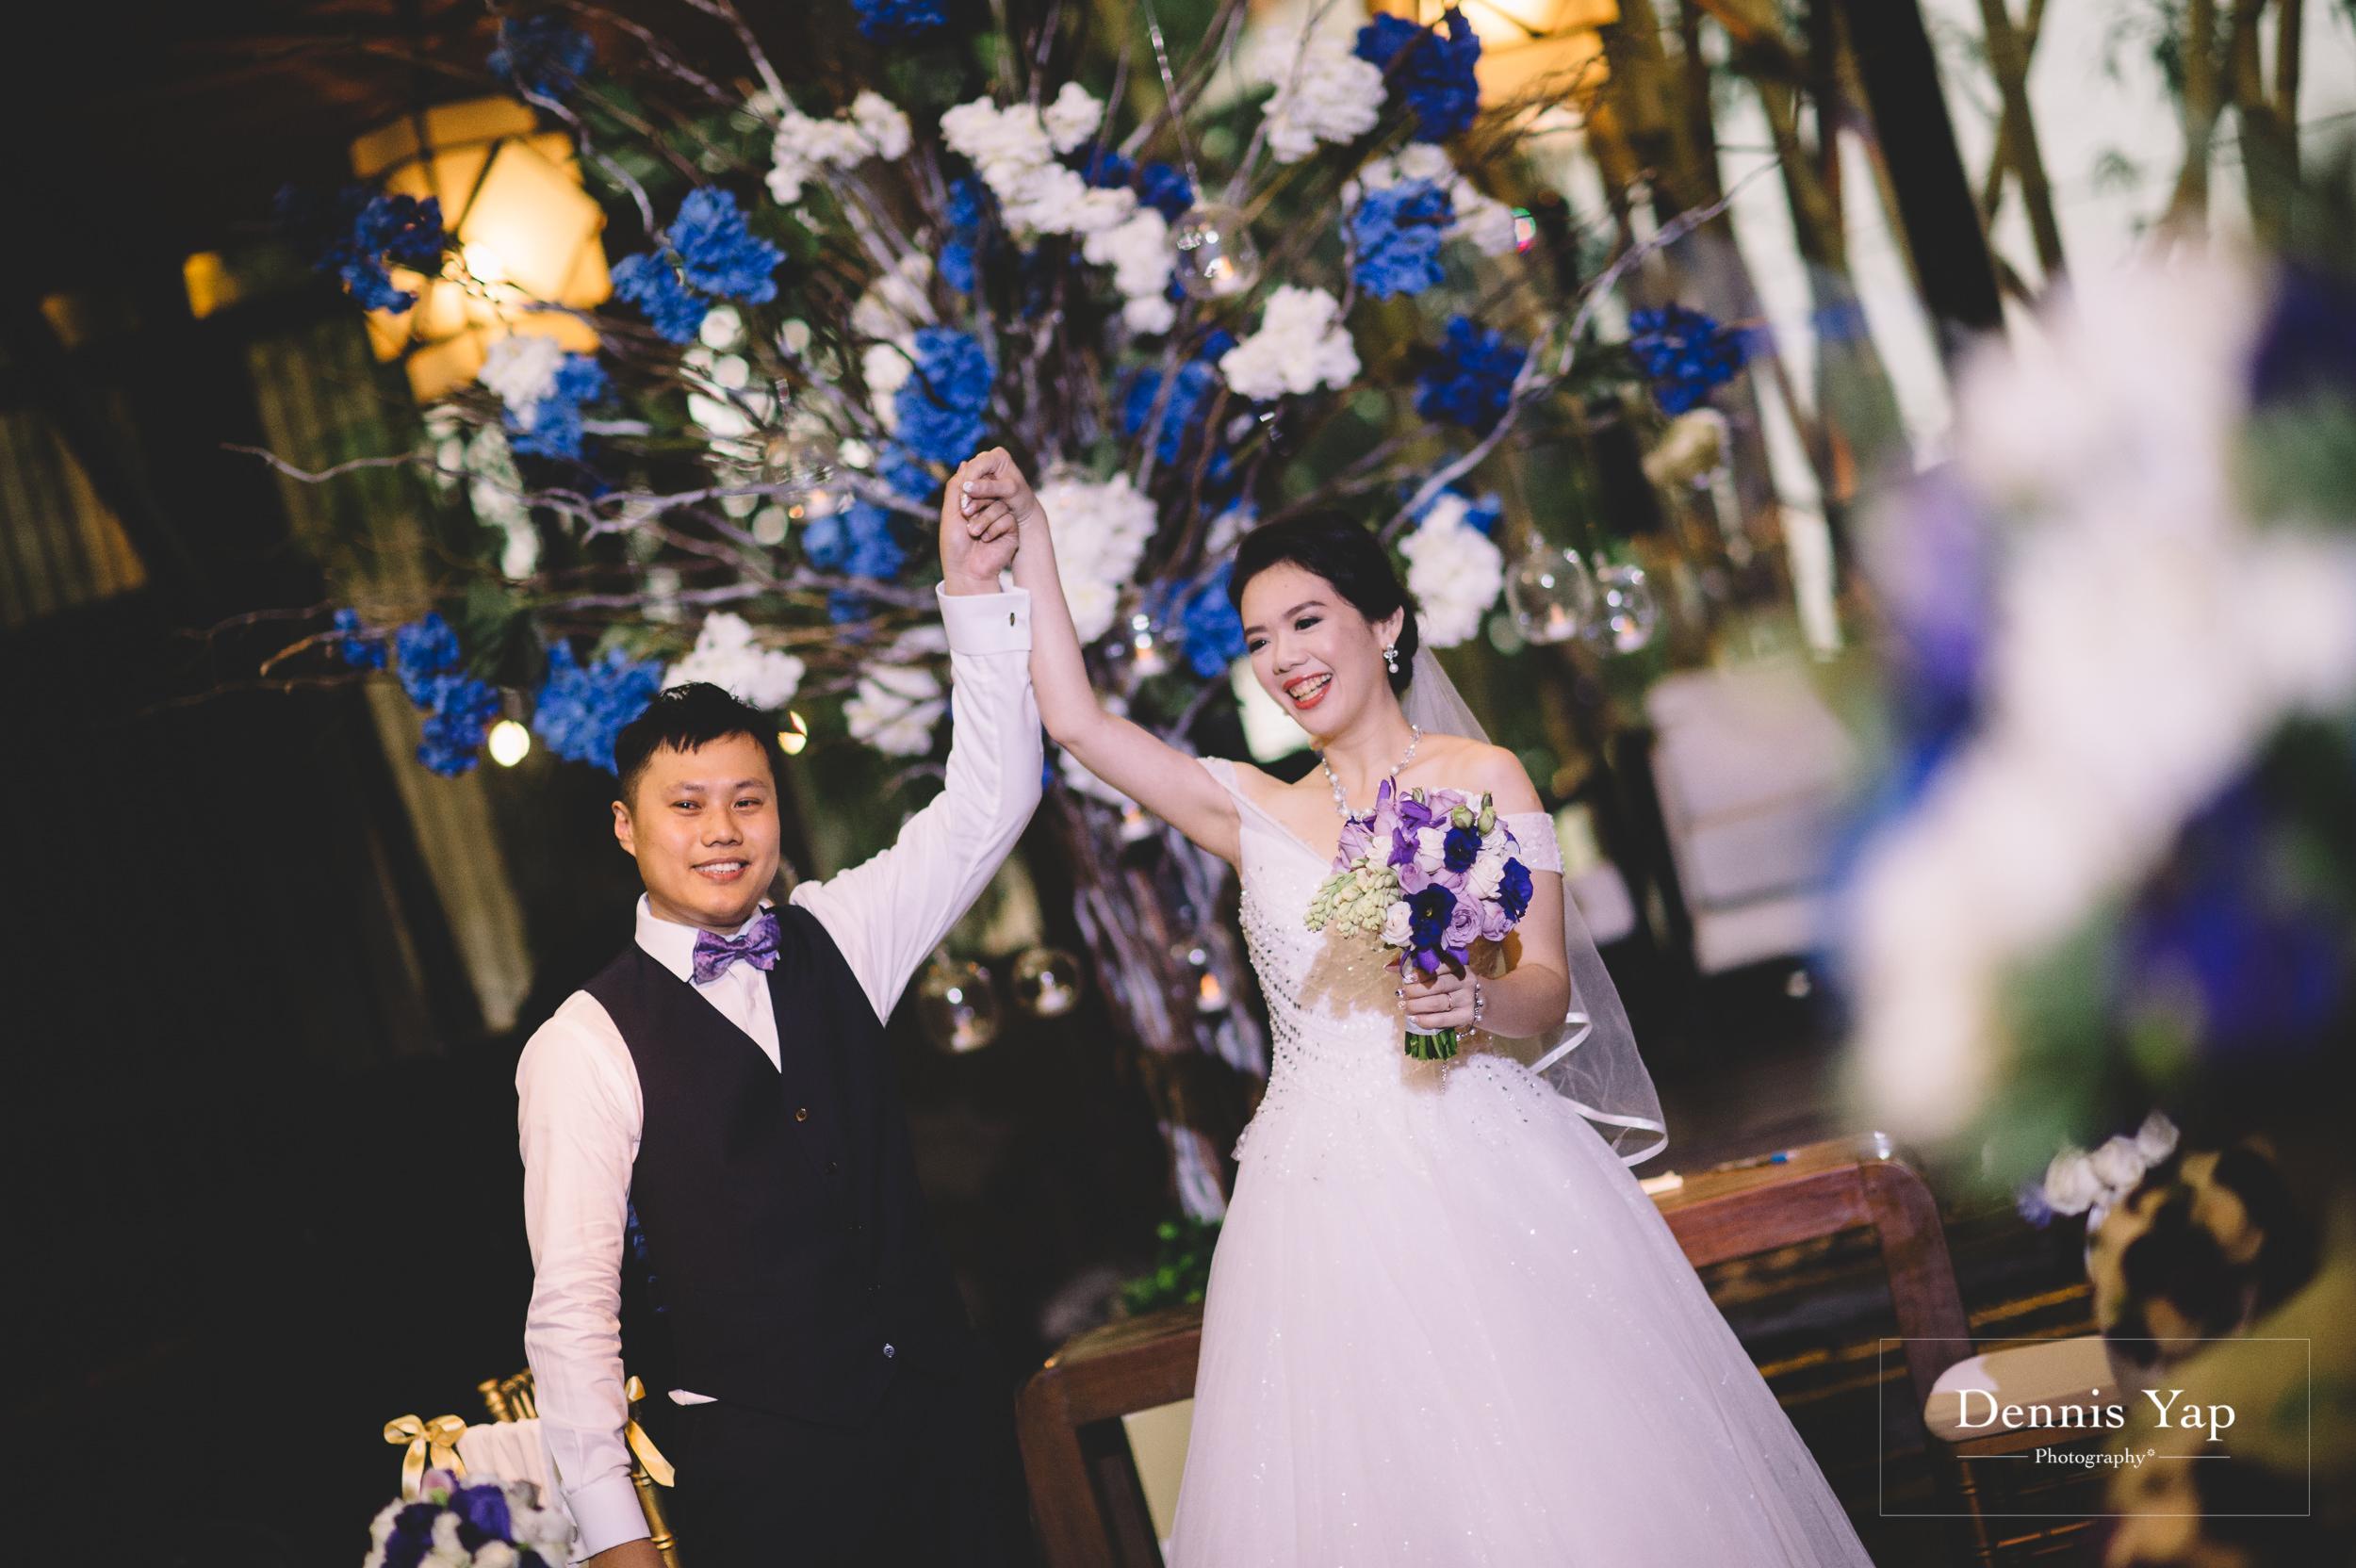 vincent peggy wedding dinner neo tamarind kuala lumpur dennis yap photography-25.jpg